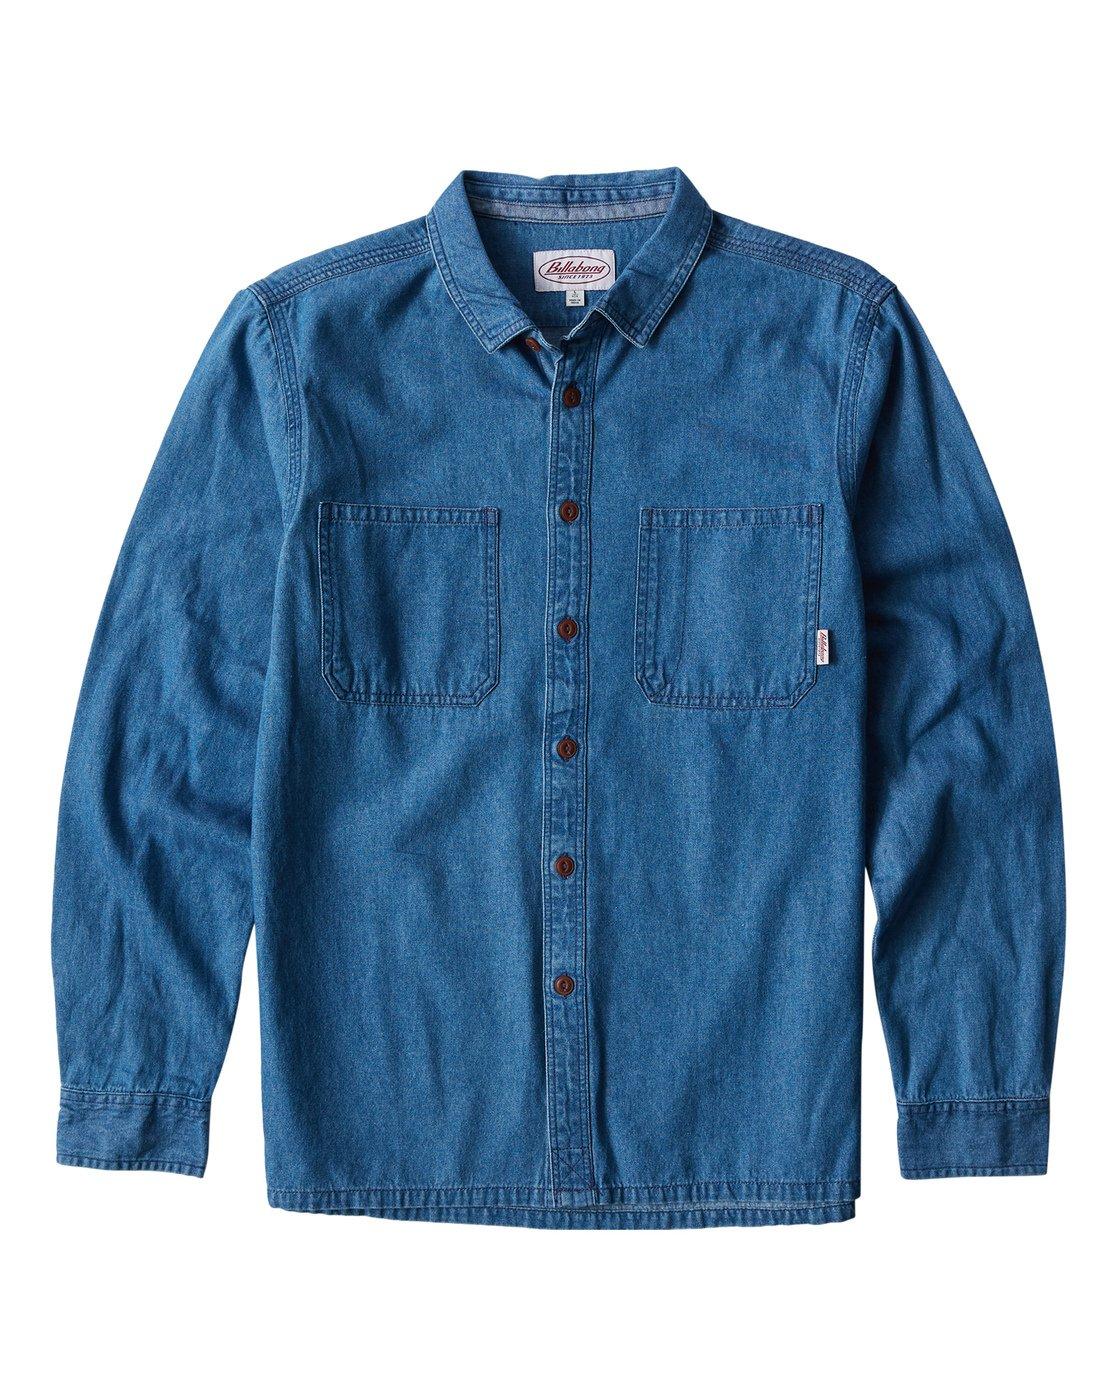 huge discount cd2f0 21e57 97 Workwear - Camicia di Jeans Smanicata da Uomo